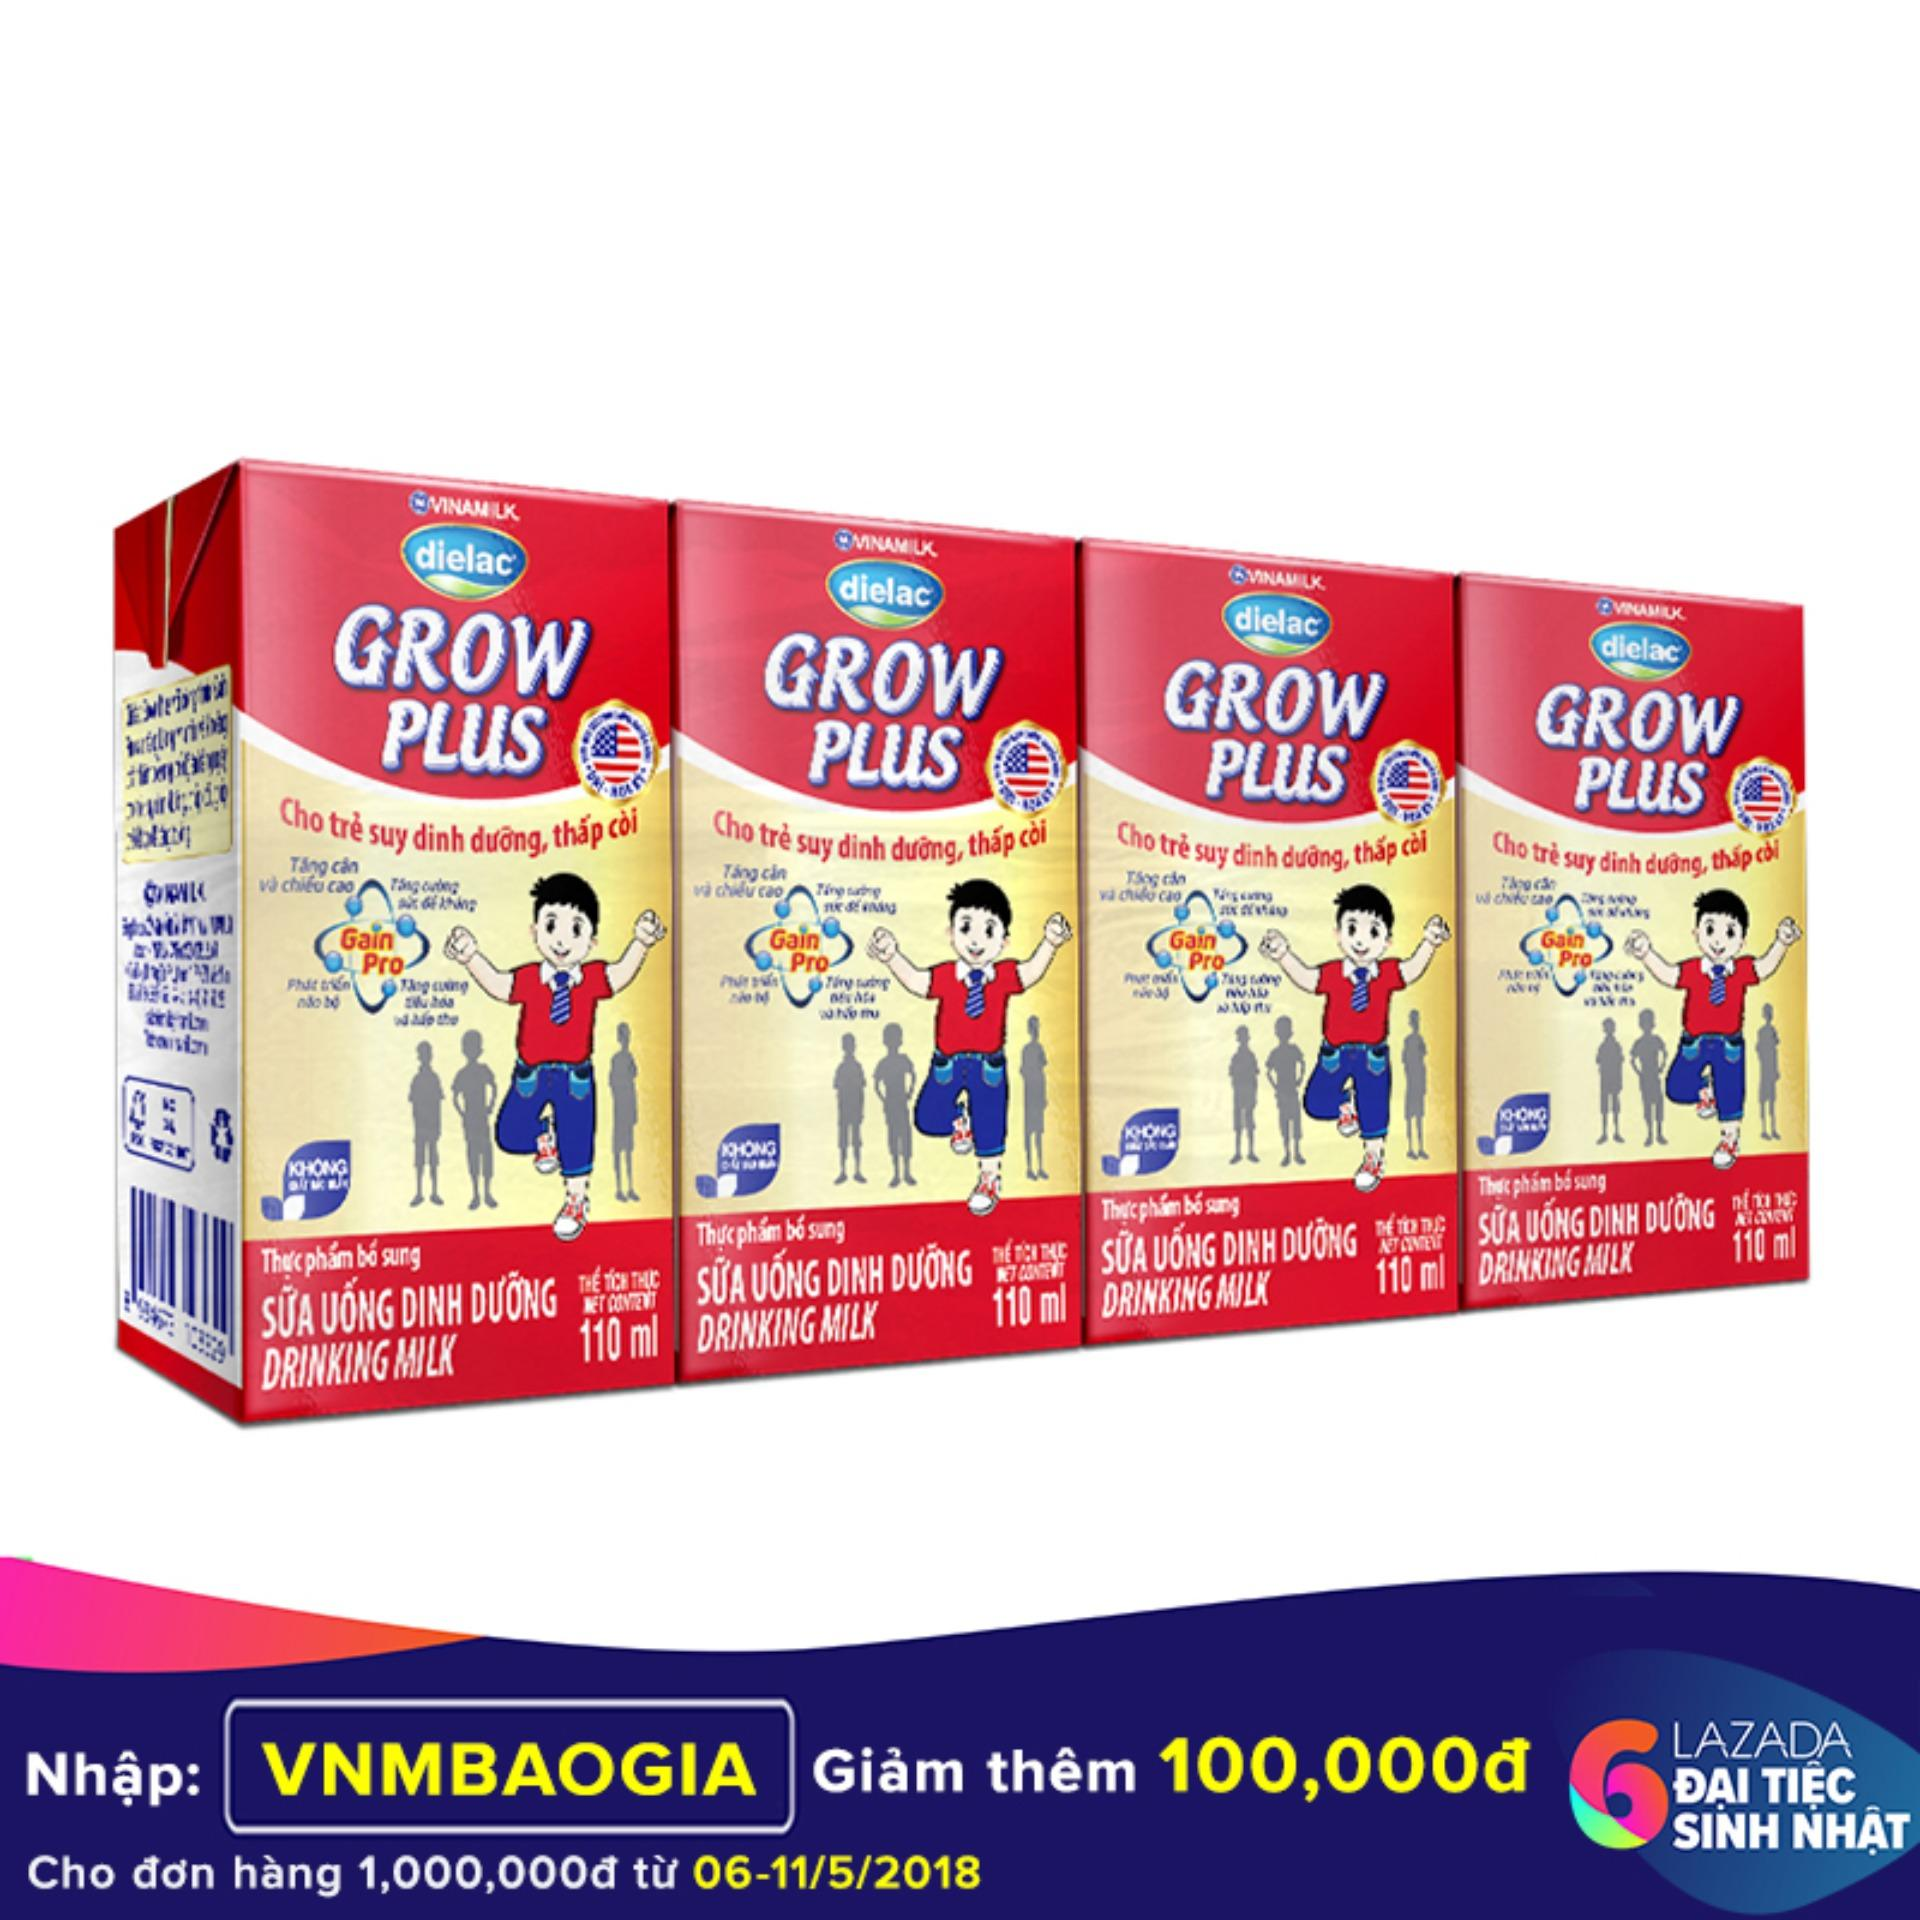 Bán Thung 48 Hộp Sữa Bột Pha Sẵn Vinamilk Dielac Grow Plus 110Ml Vinamilk Nguyên